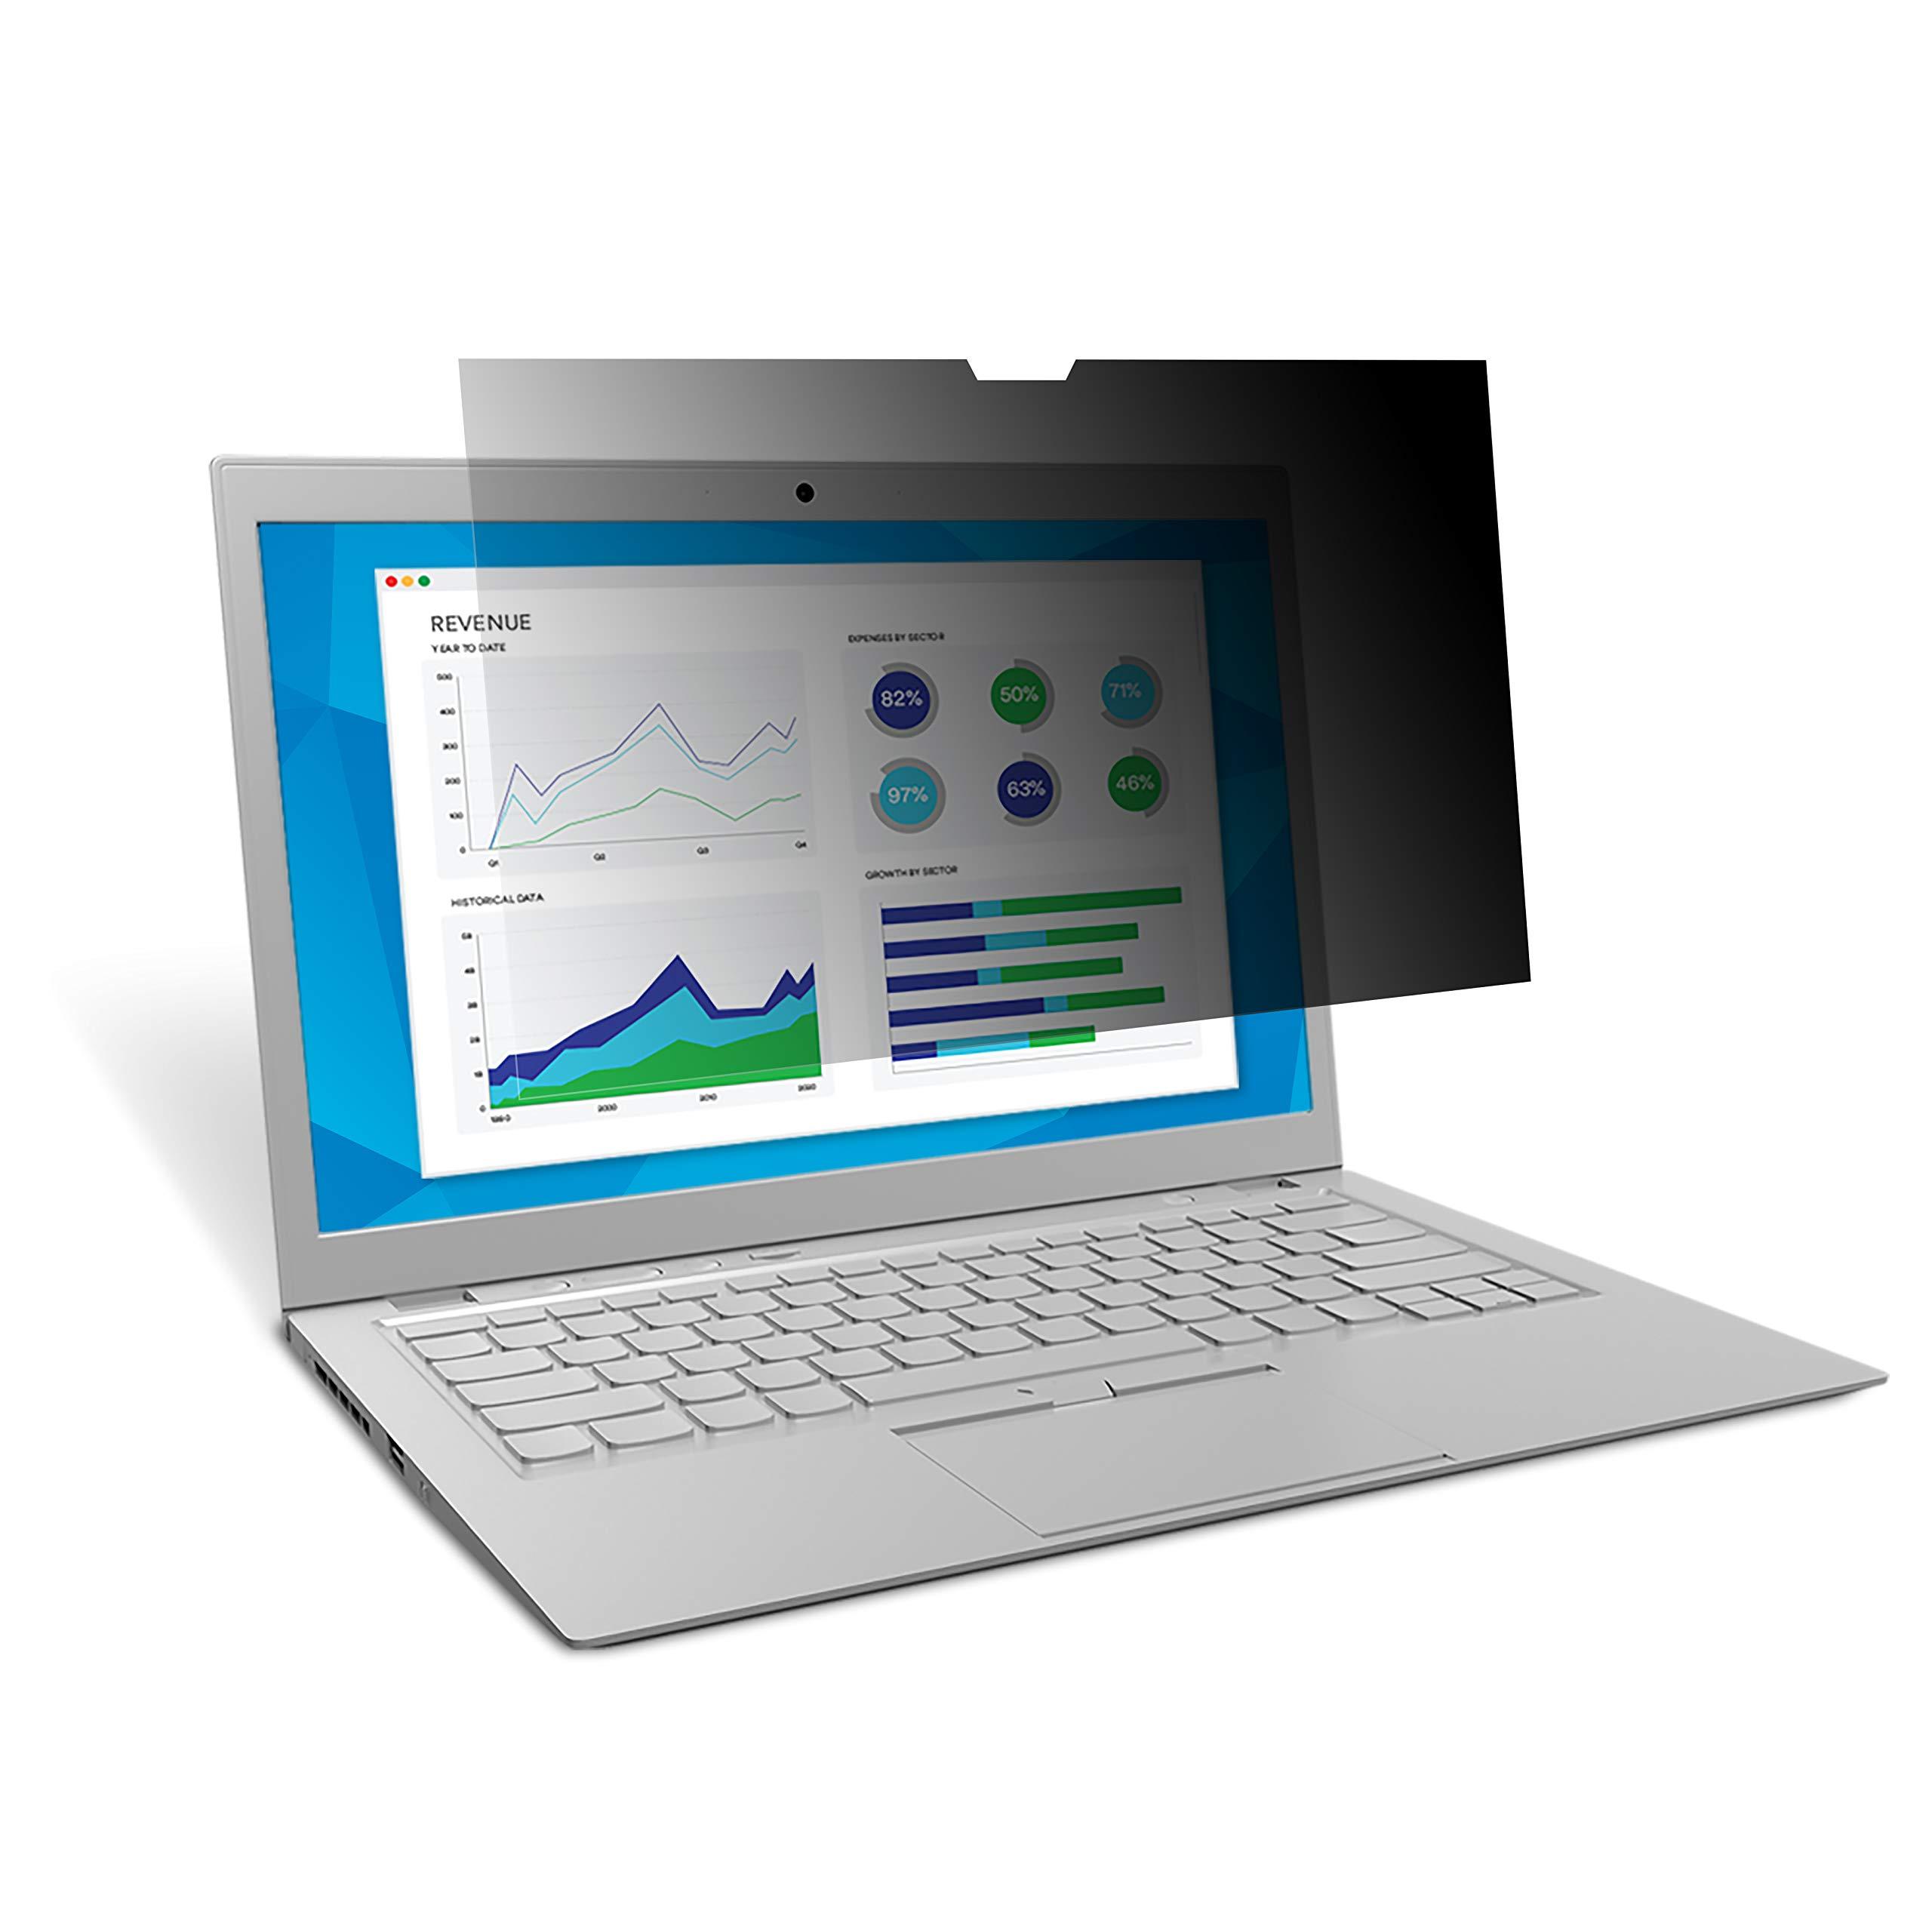 3M Privacy Filter for 13.3'' Edge-to-Edge Widescreen Laptop (PF133W9E)